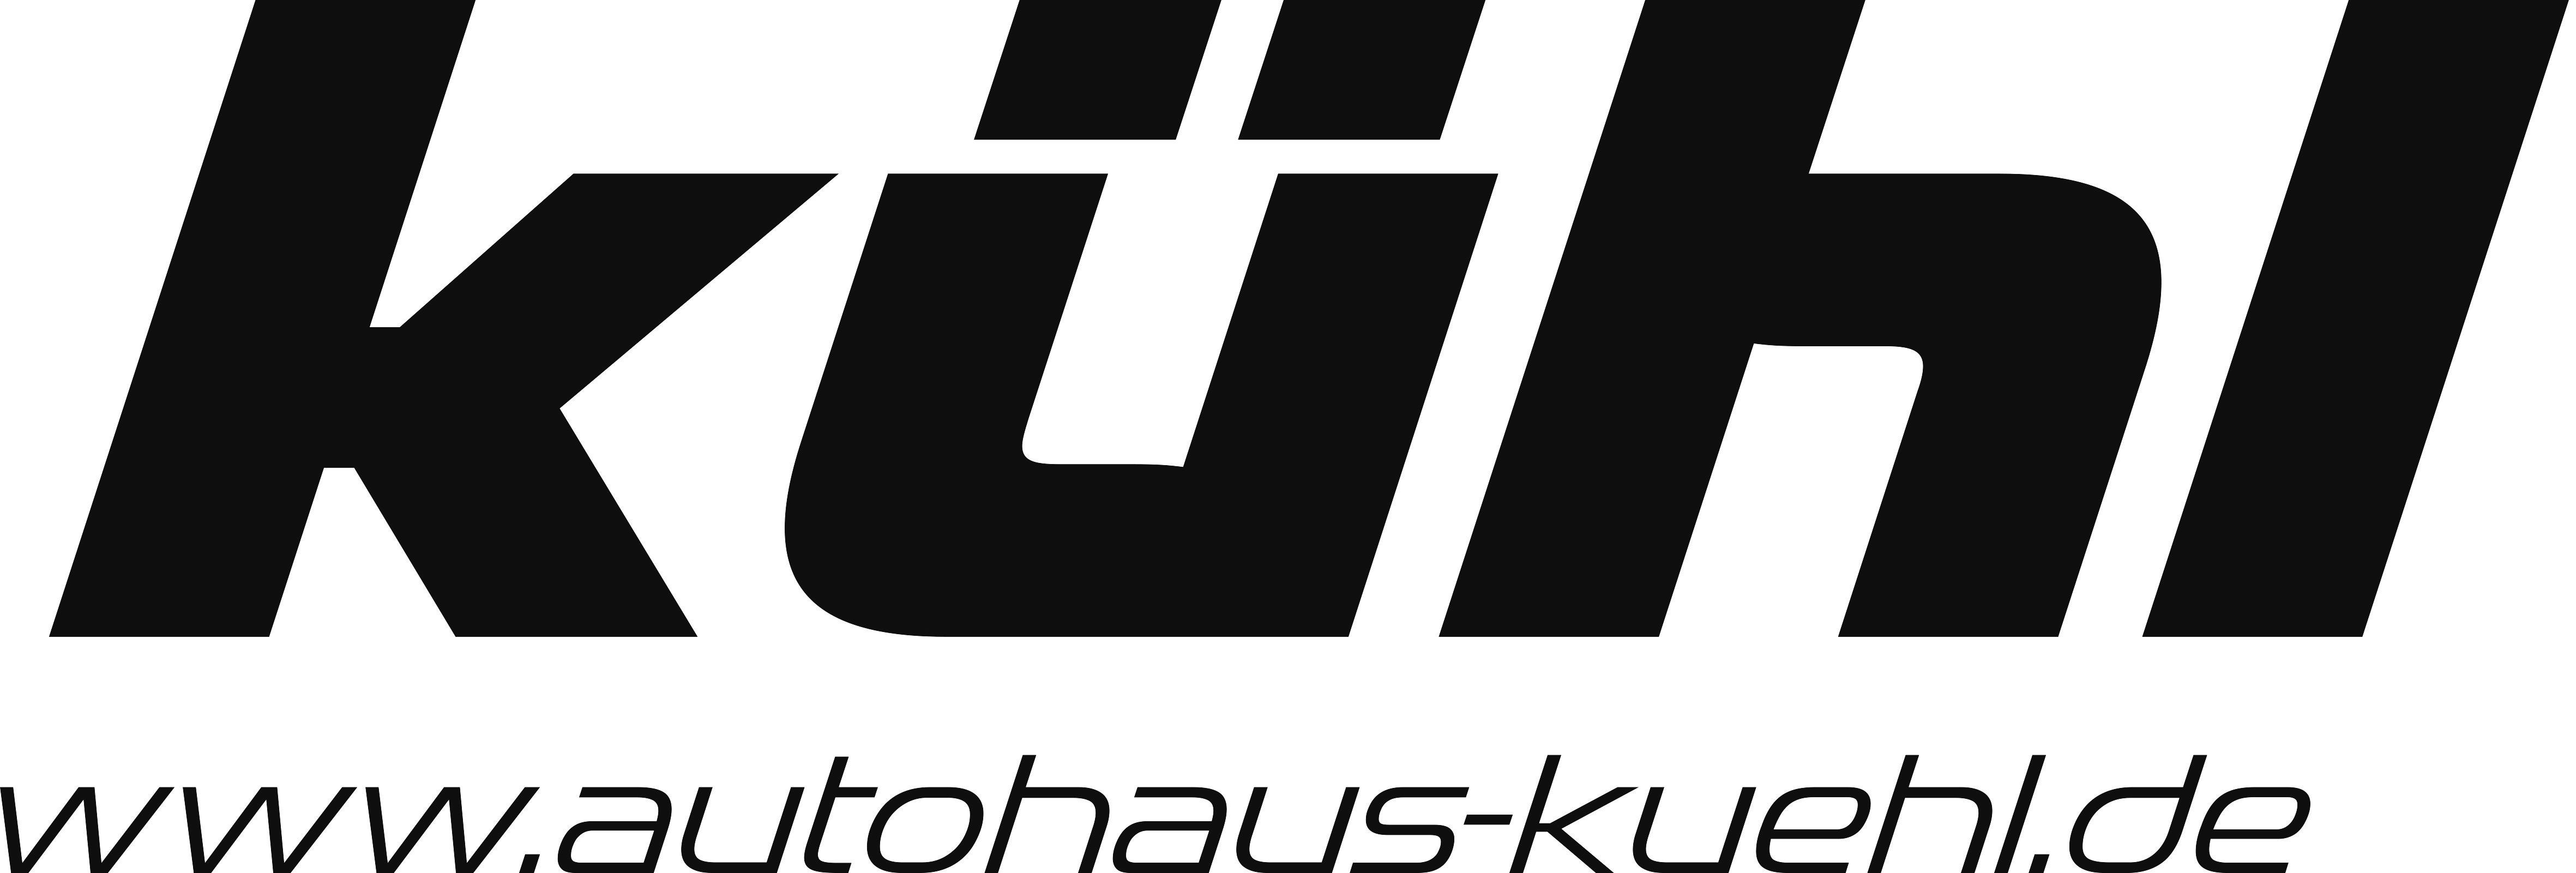 Autohaus Kuehl